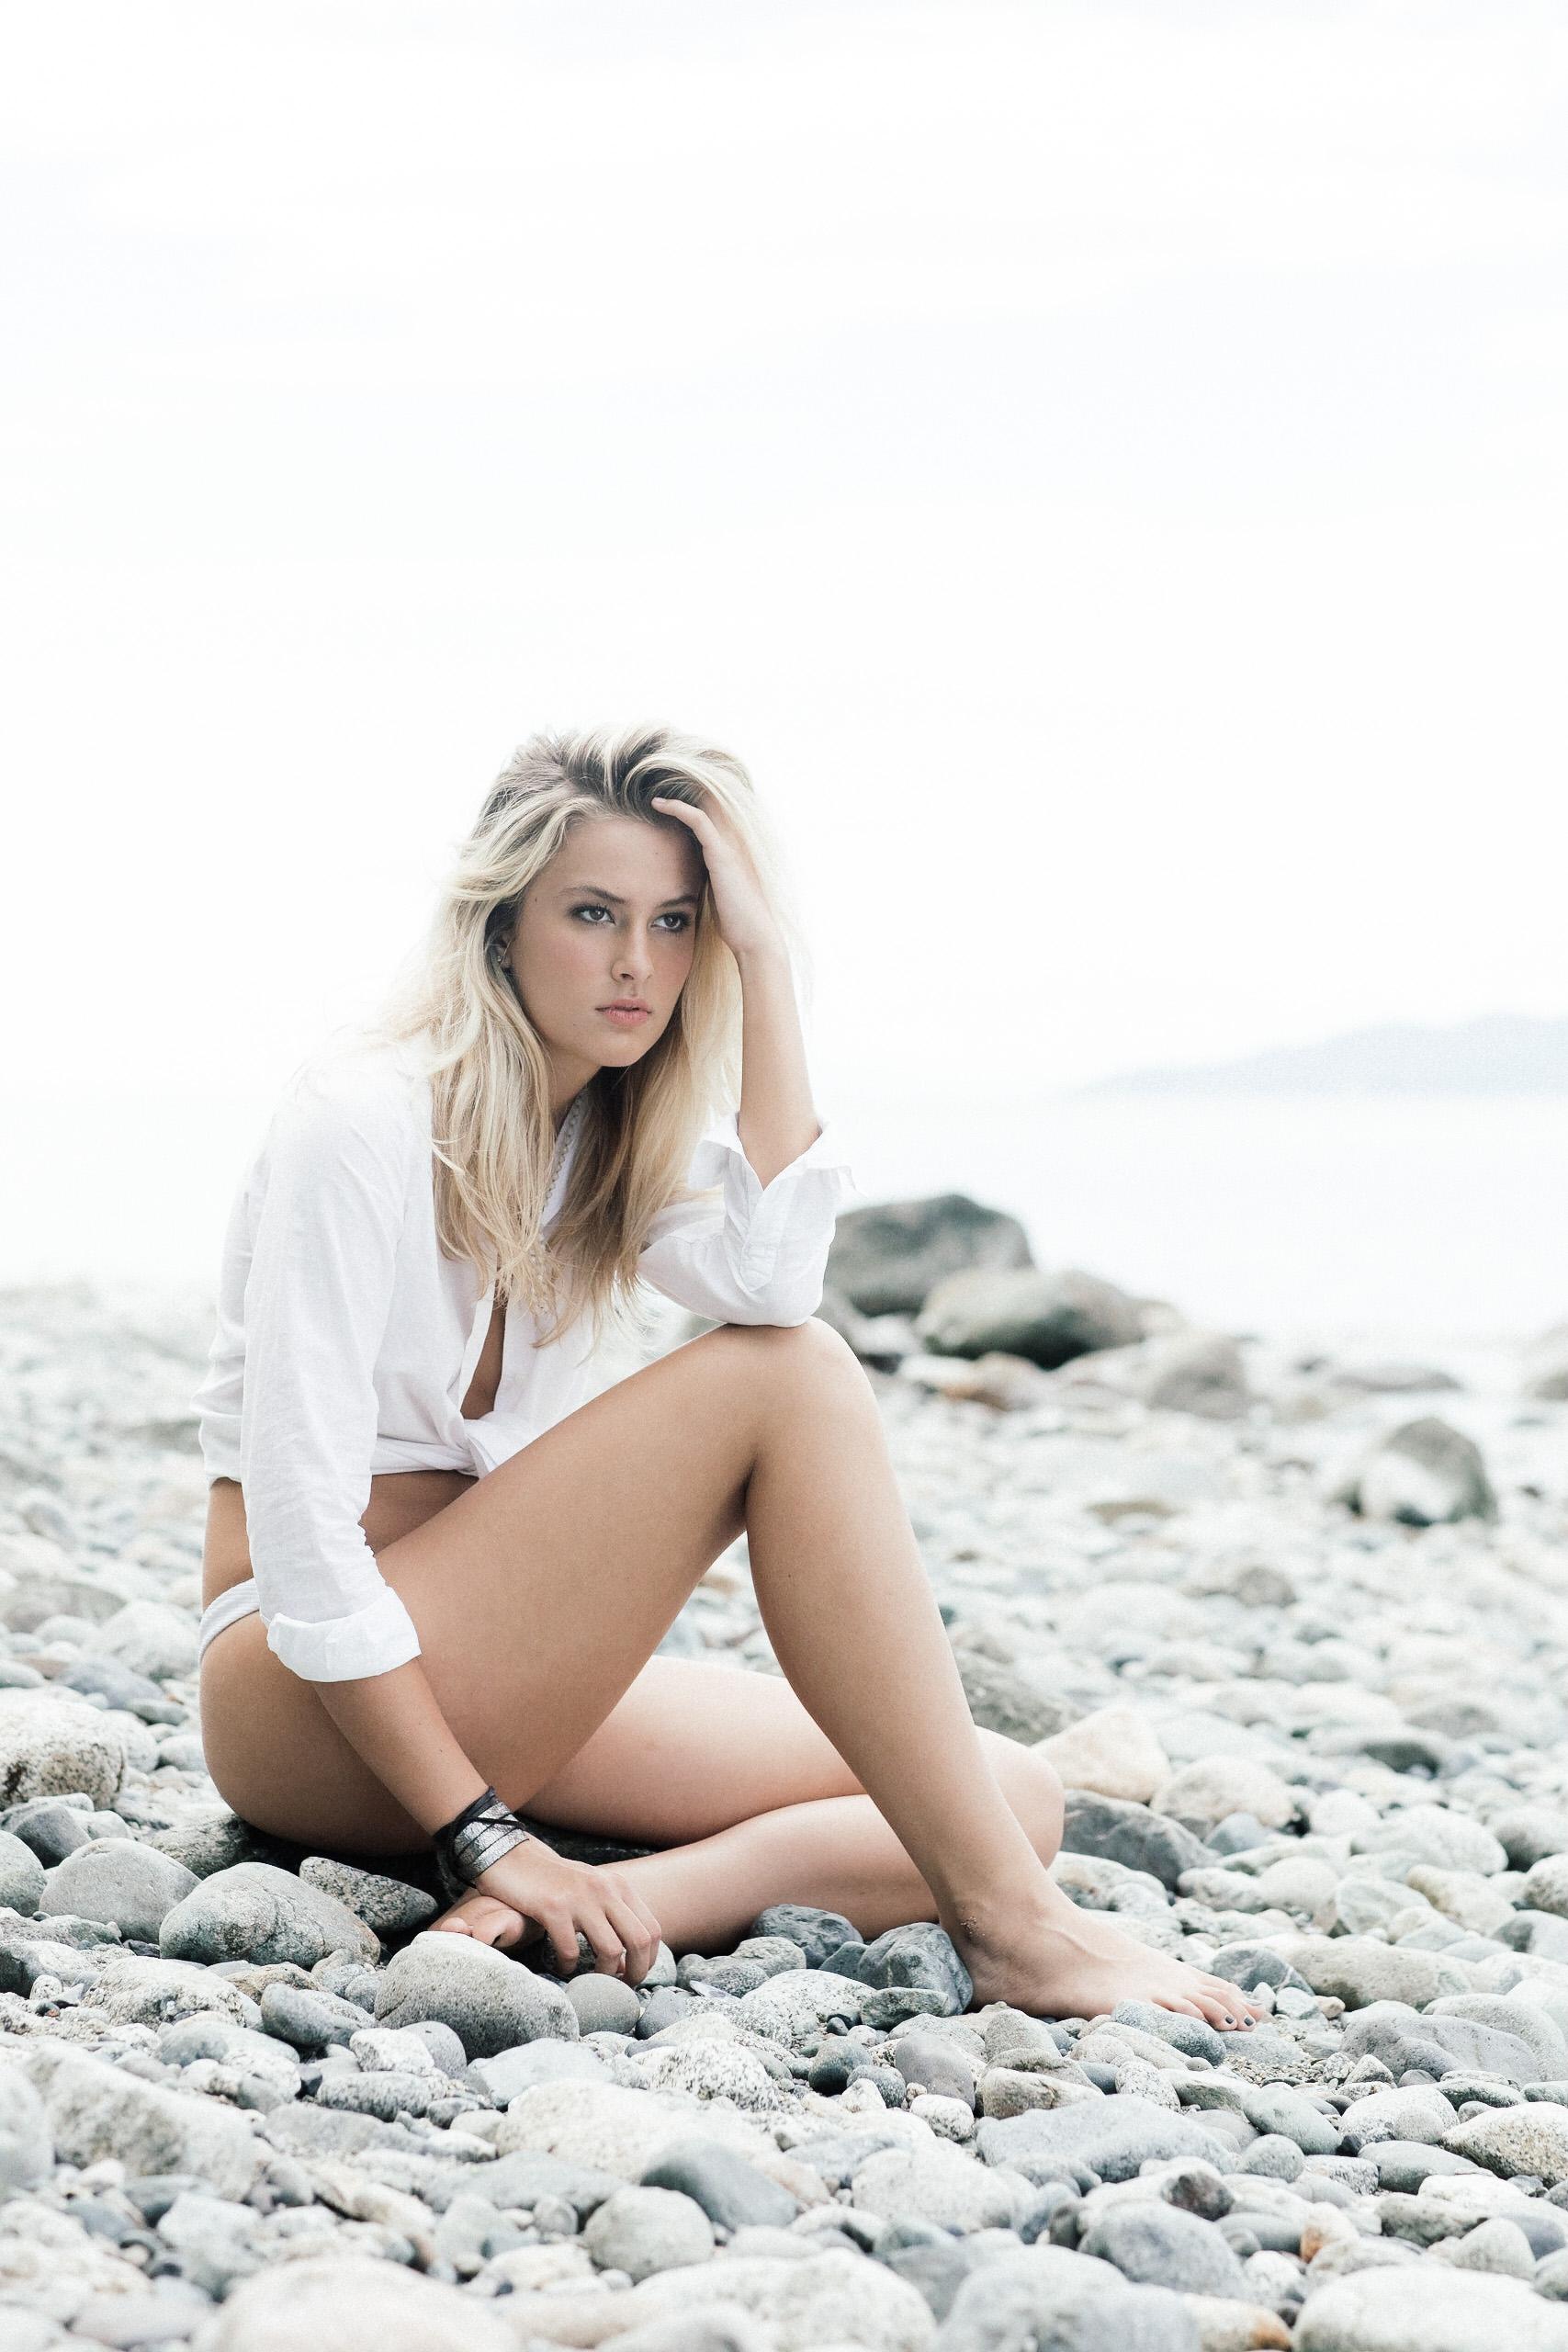 A beach editorial photo of Corinne Isherwood.